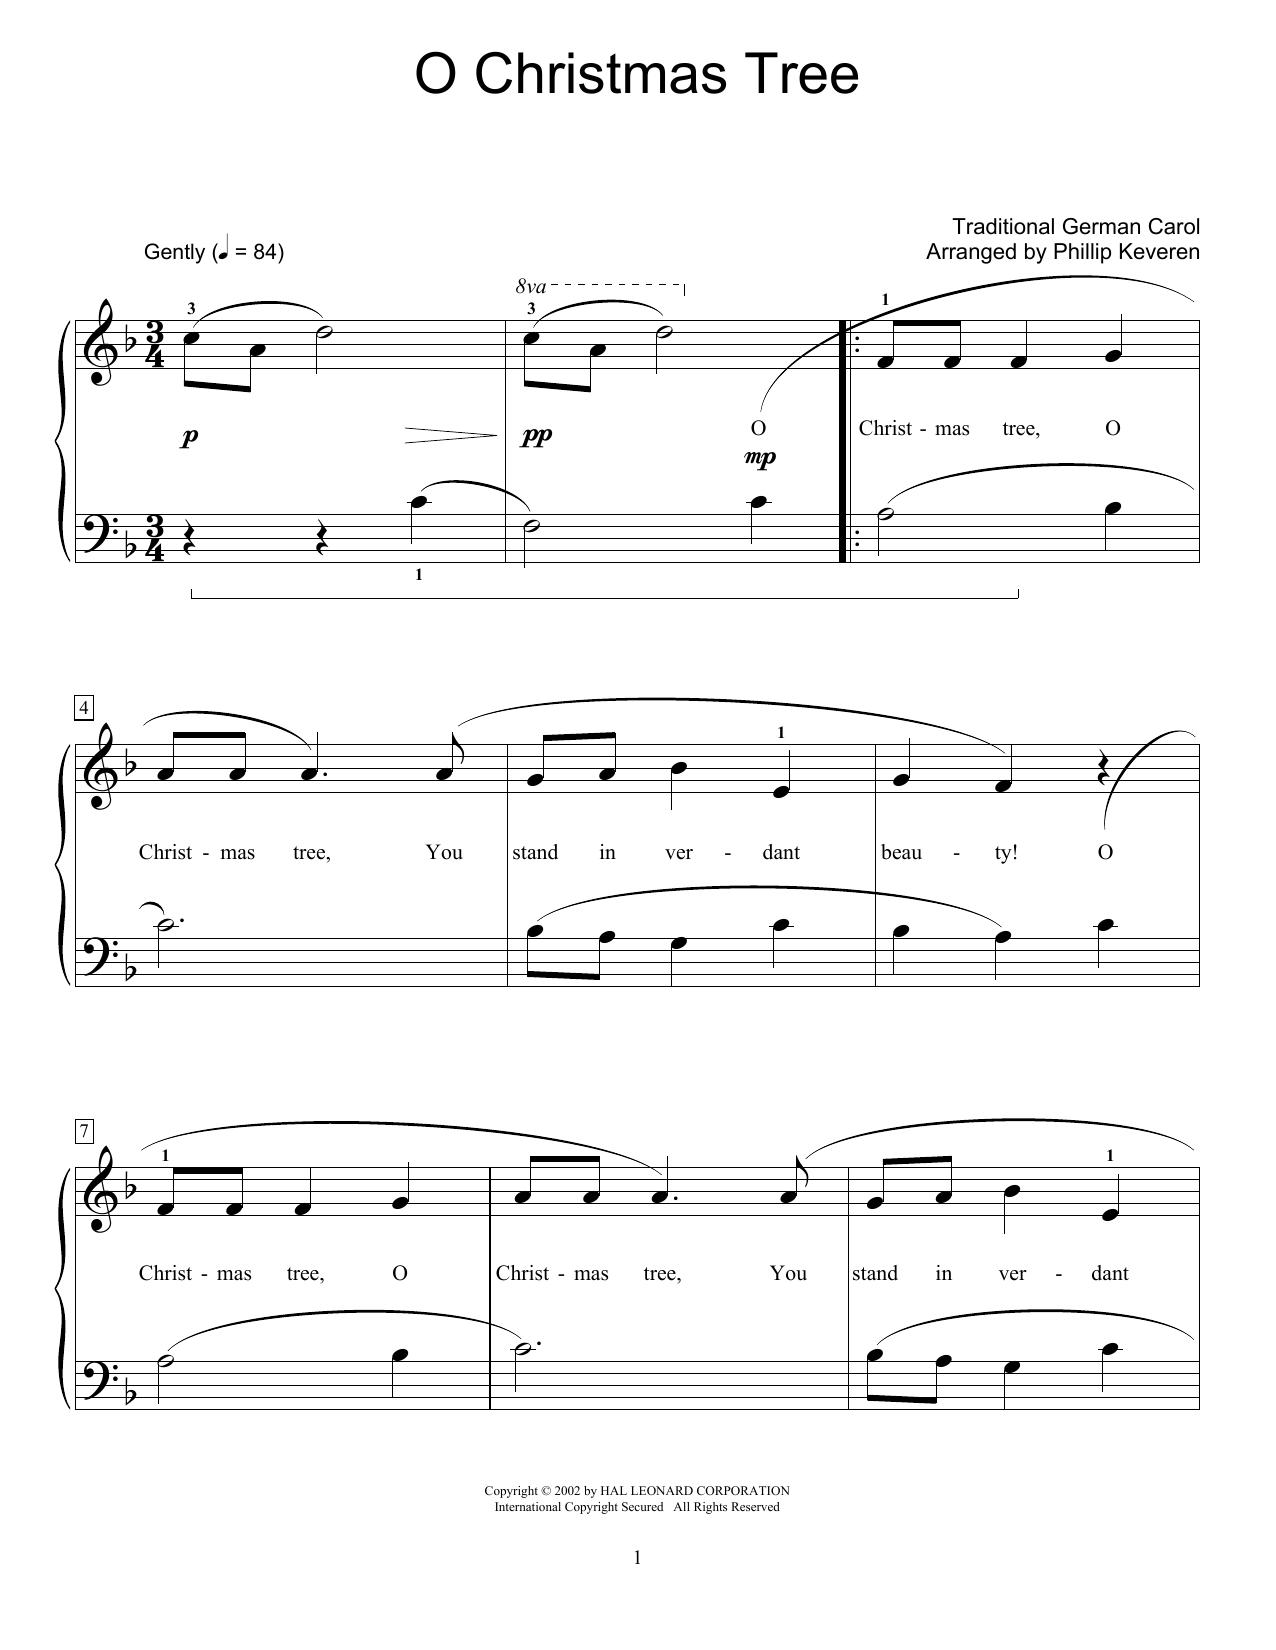 New choir sheet music on Modern Score : Traditional German Carol: O ...